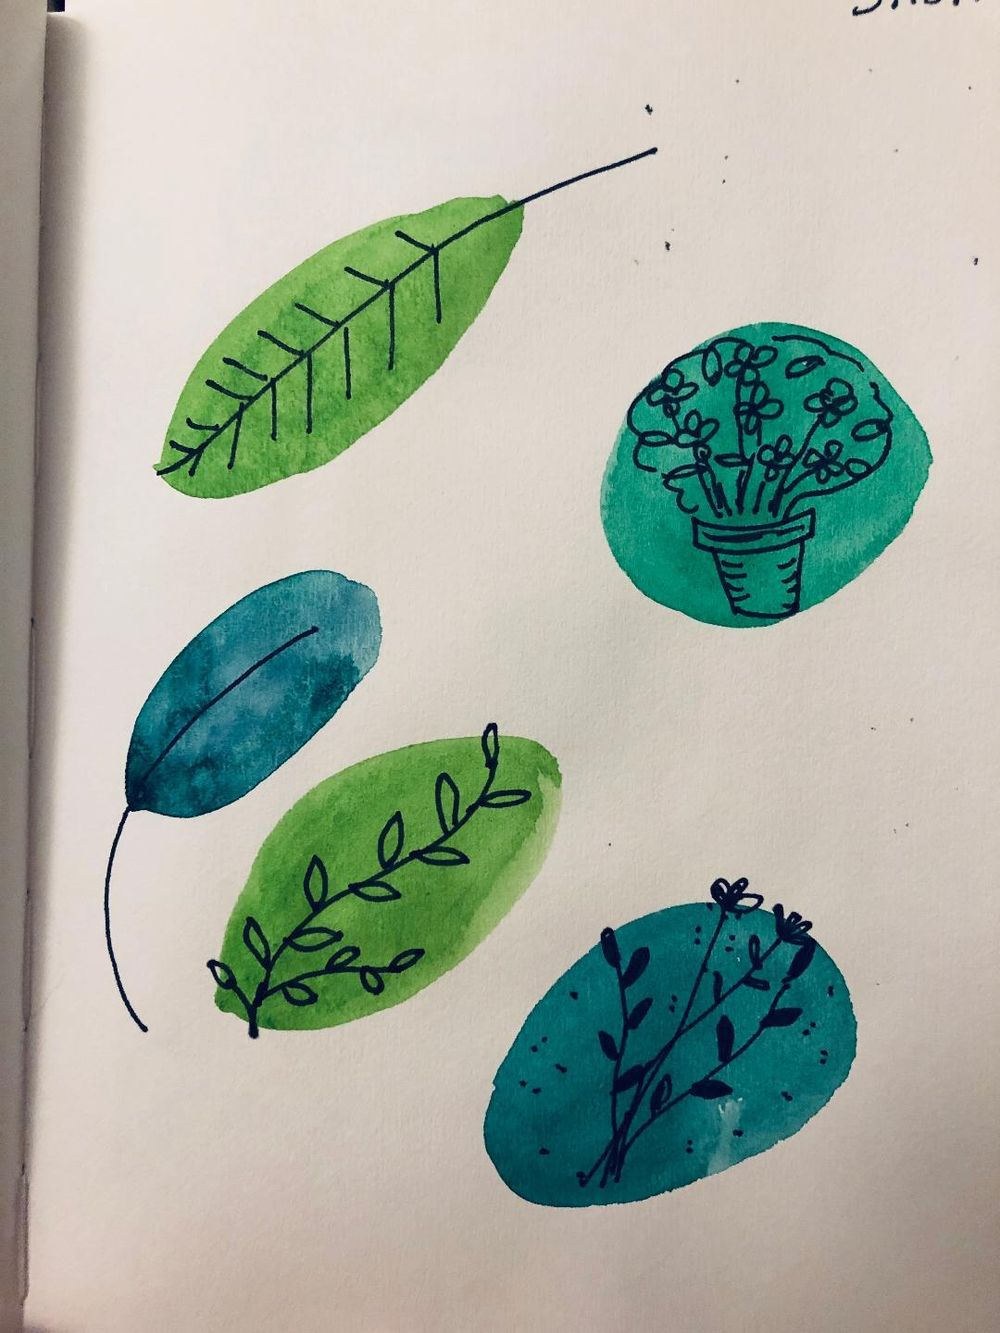 Exploring sketchbooks - image 2 - student project